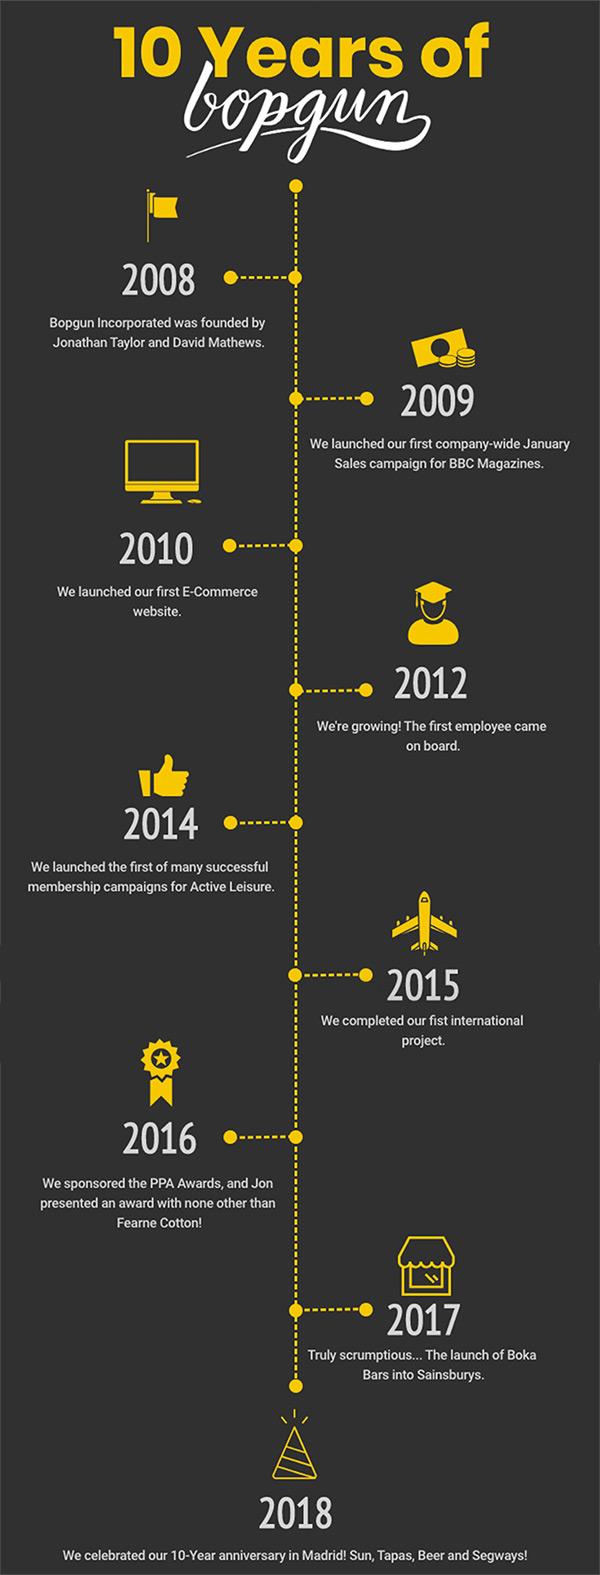 10 years of Bopgun timeline